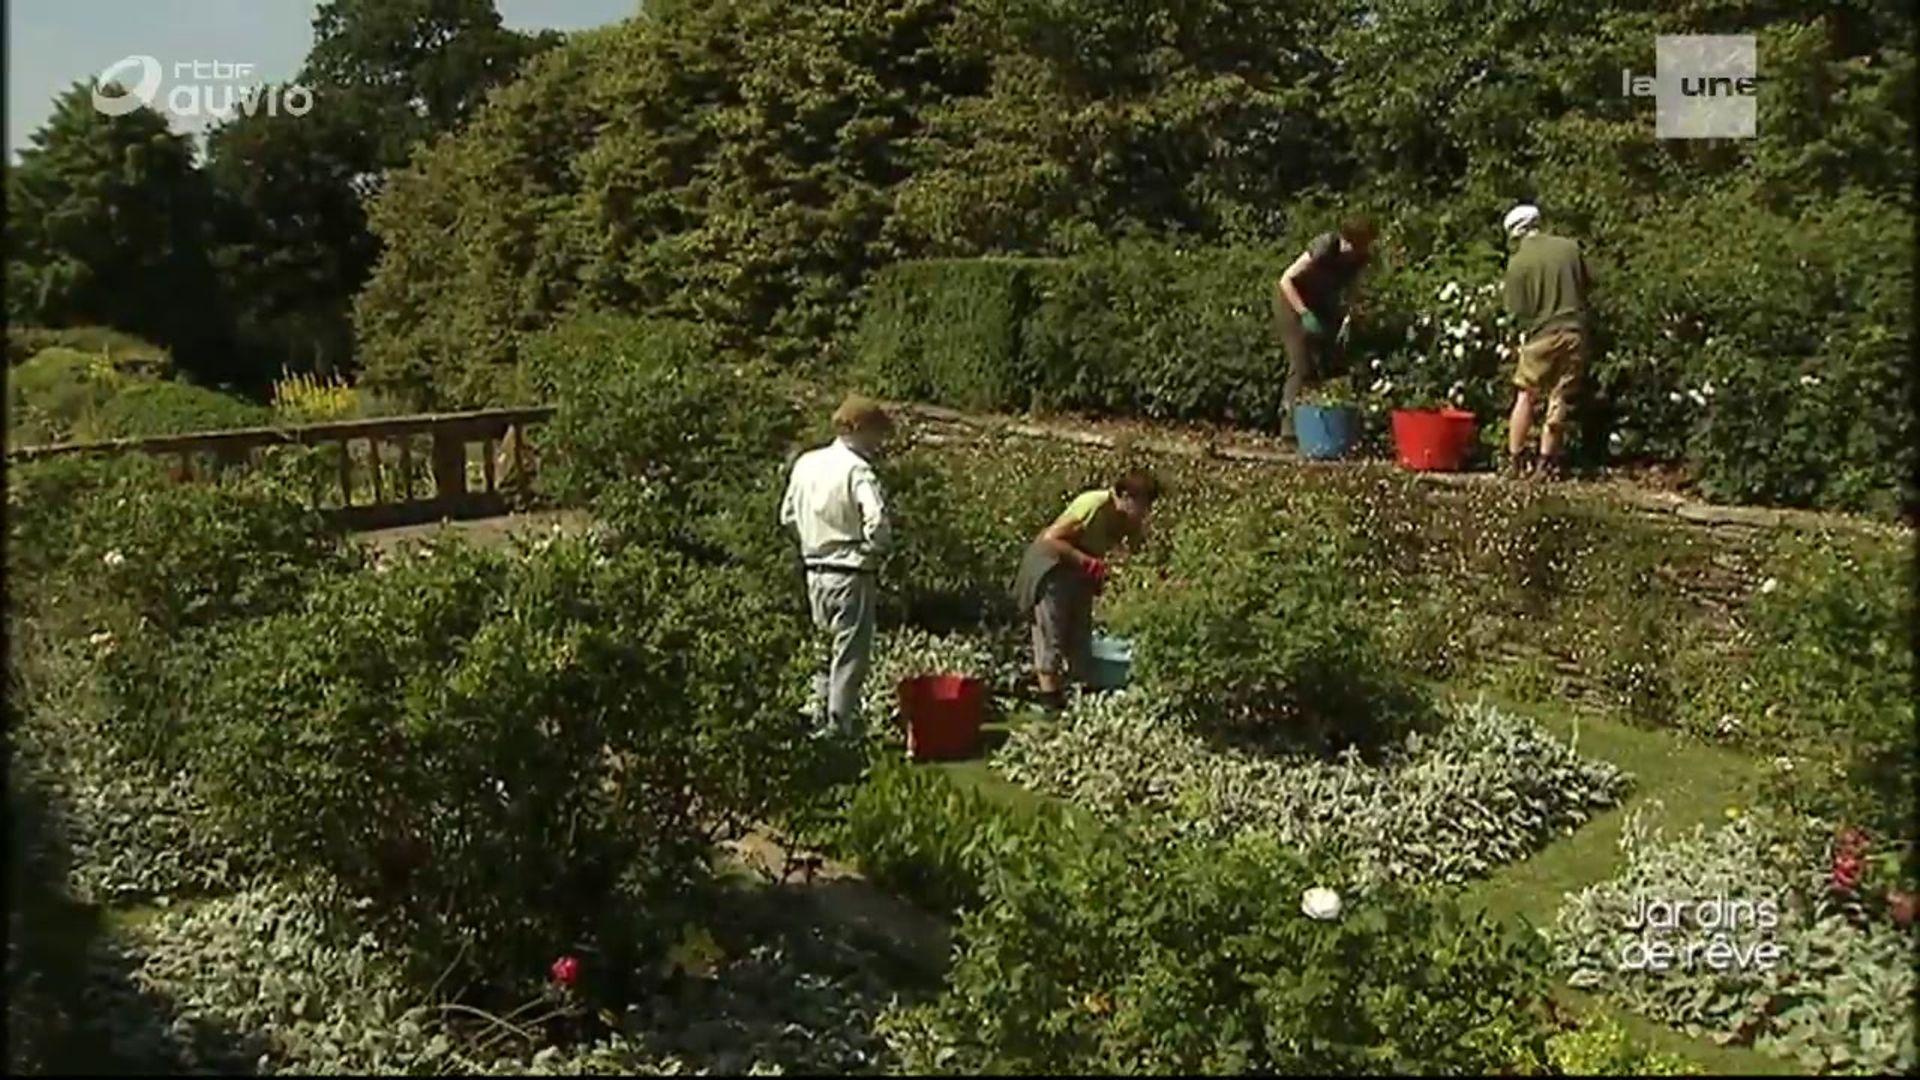 Https Www Rtbf Be Auvio Detail Les Jardins De Reve De Luc Noel Id